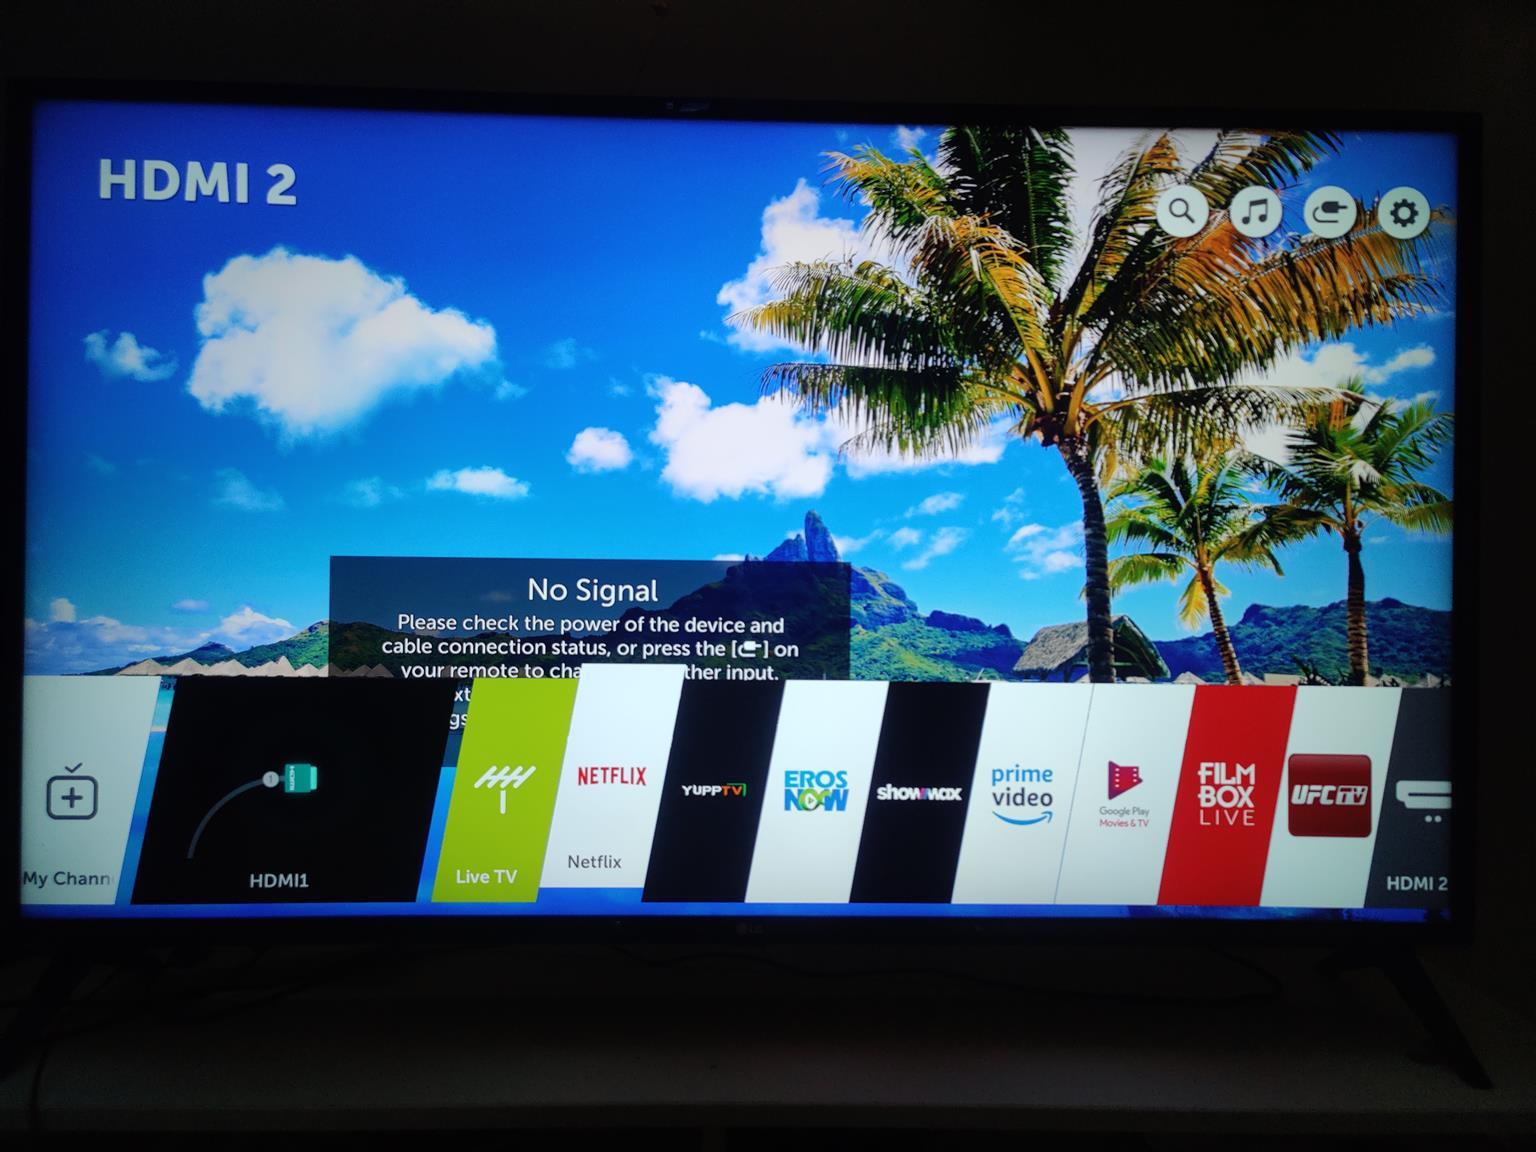 Lg 50 inch uhd smart led tv as new X3 hdmi usb